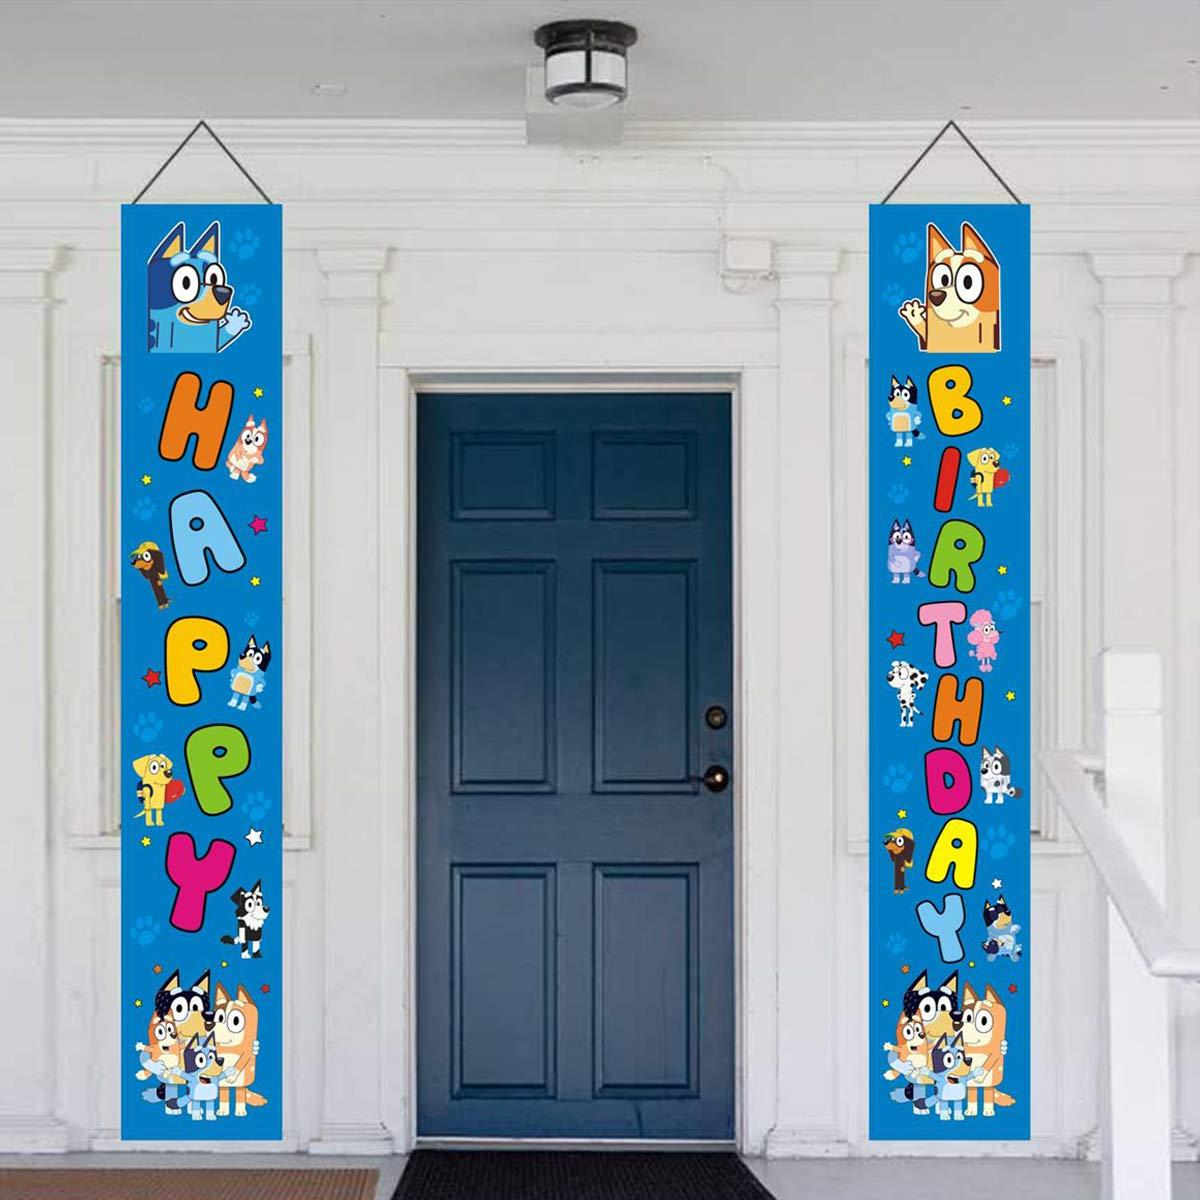 Bluey birthday banner,Bluey theme party decoration Bluey couplet porch sign door window